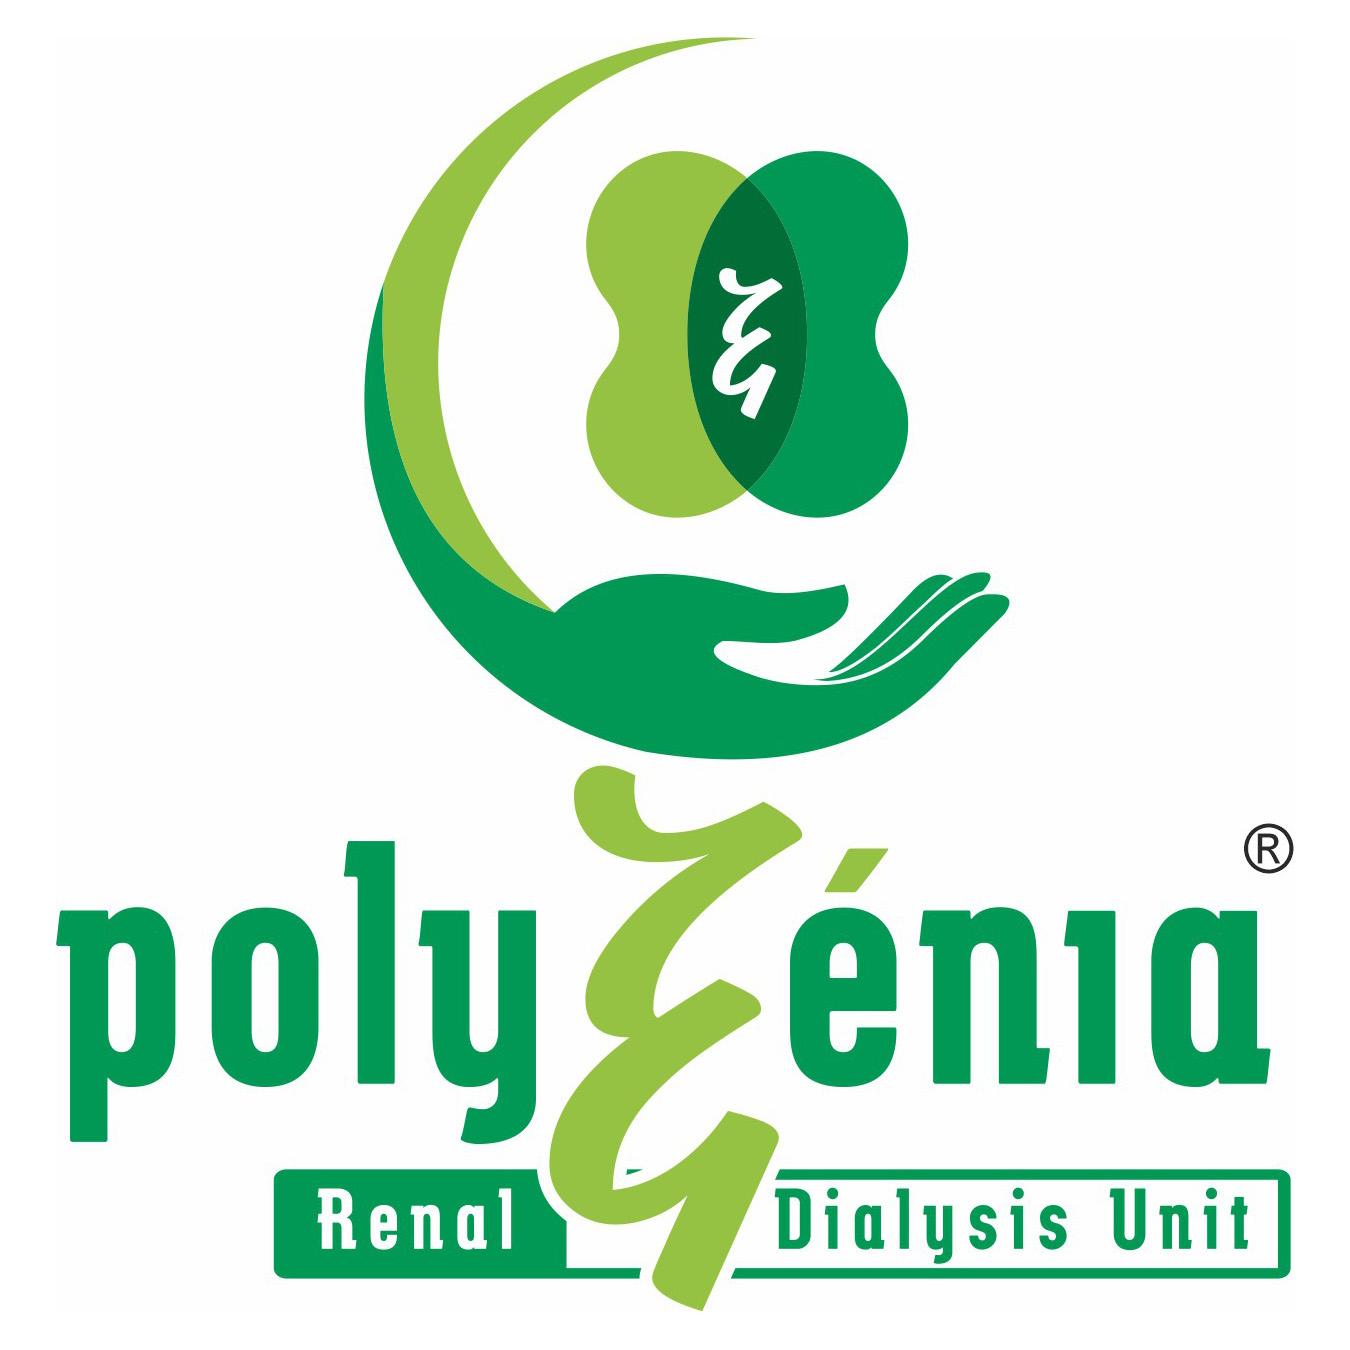 Polyxenia-Renal